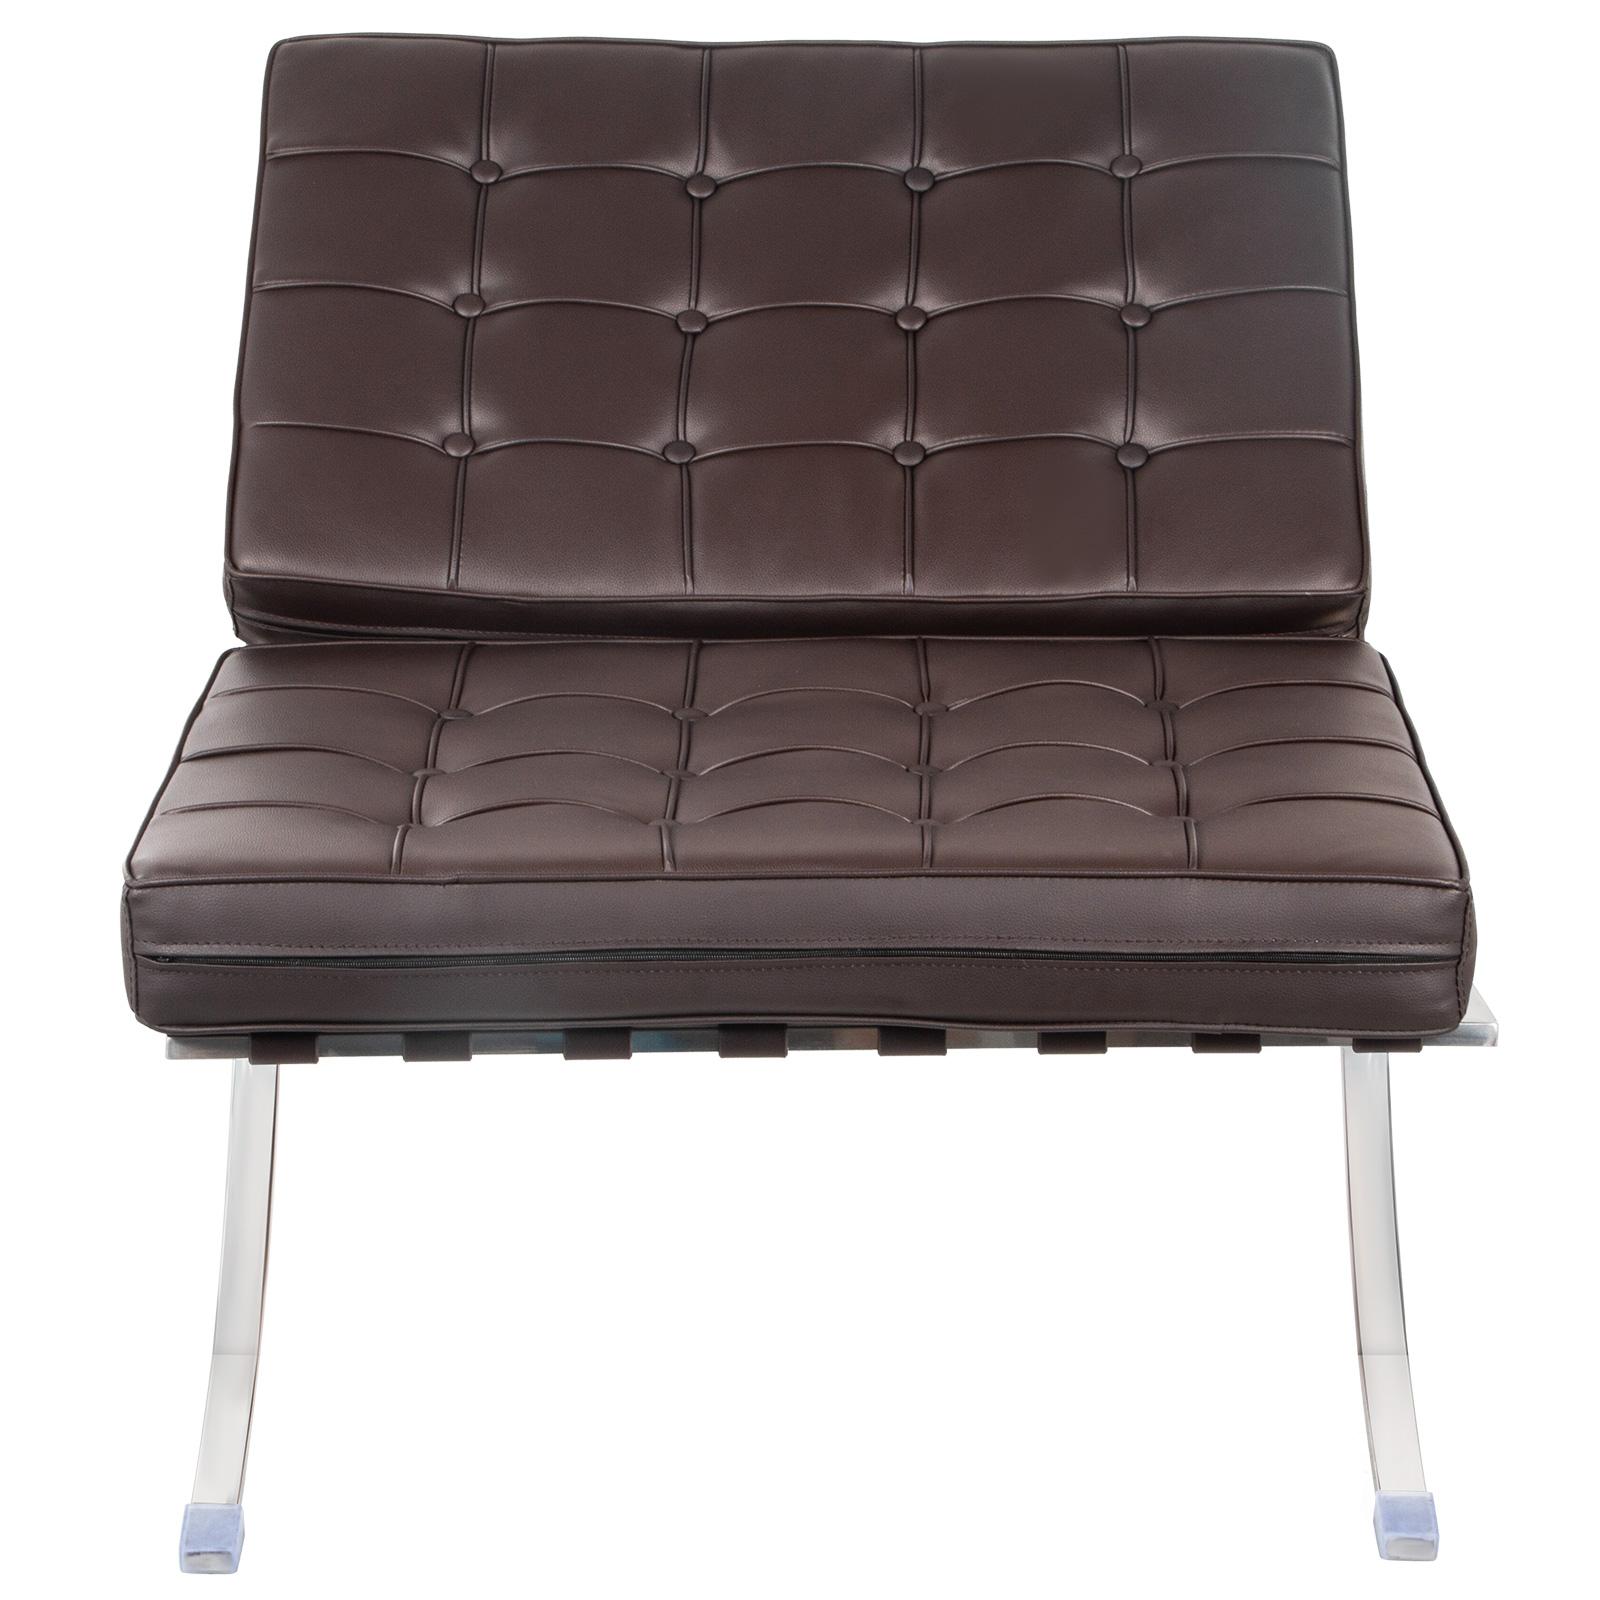 Lounge Chair Mid Century Modern Classic Barcelona Style Pu